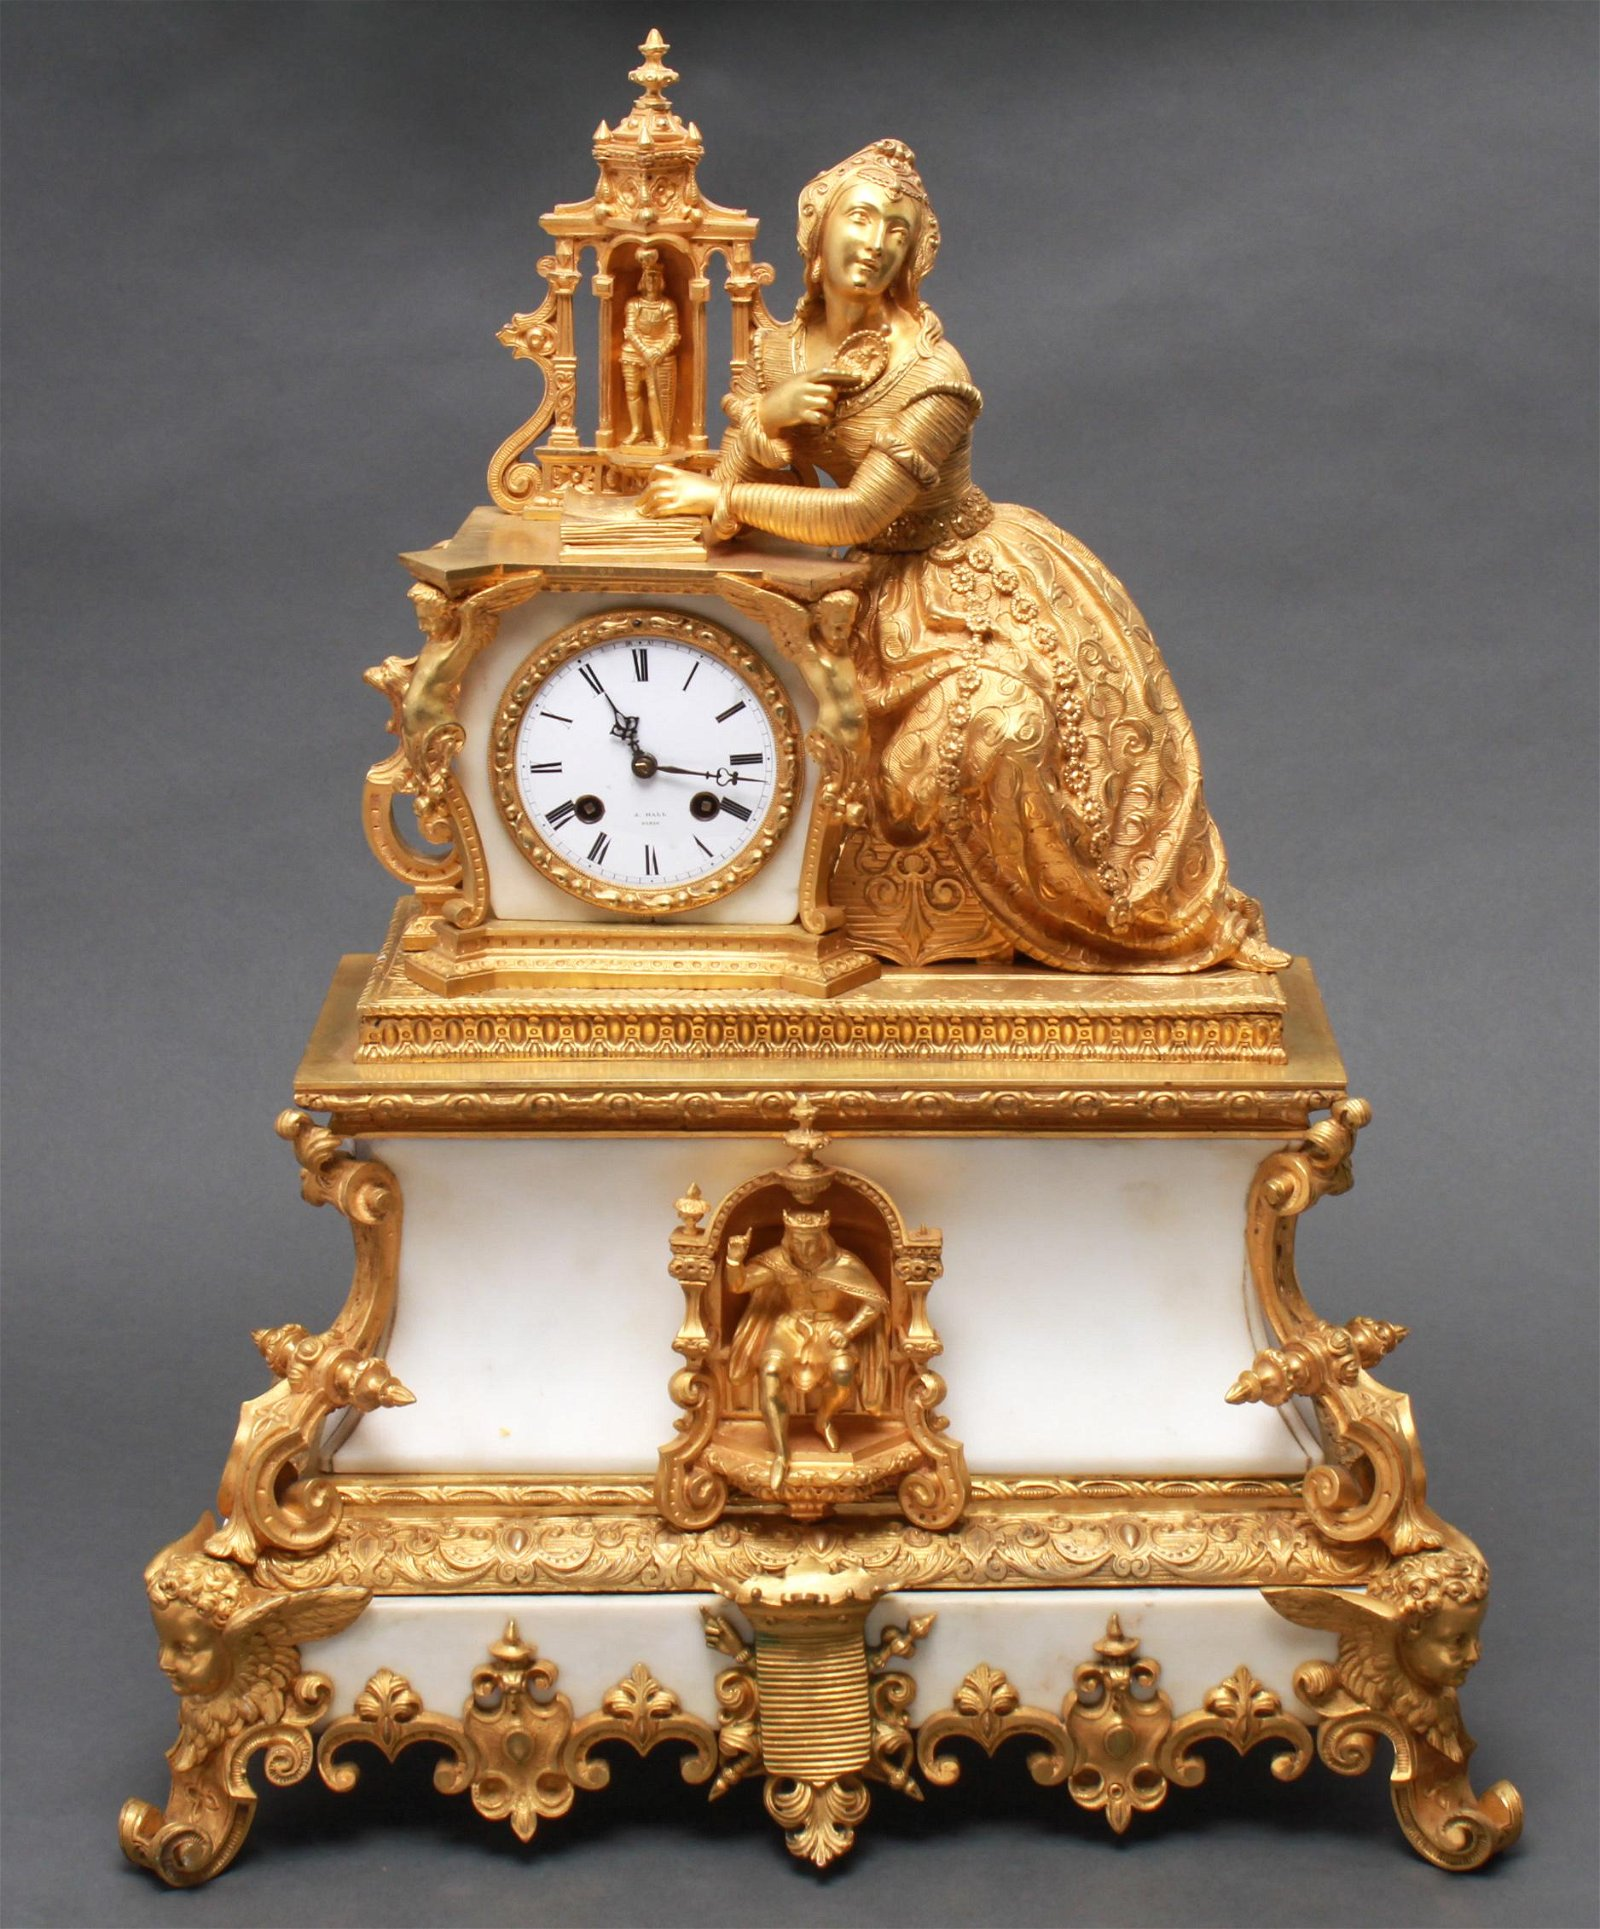 J. Hall Paris French Gilt Bronze Figurative Clock